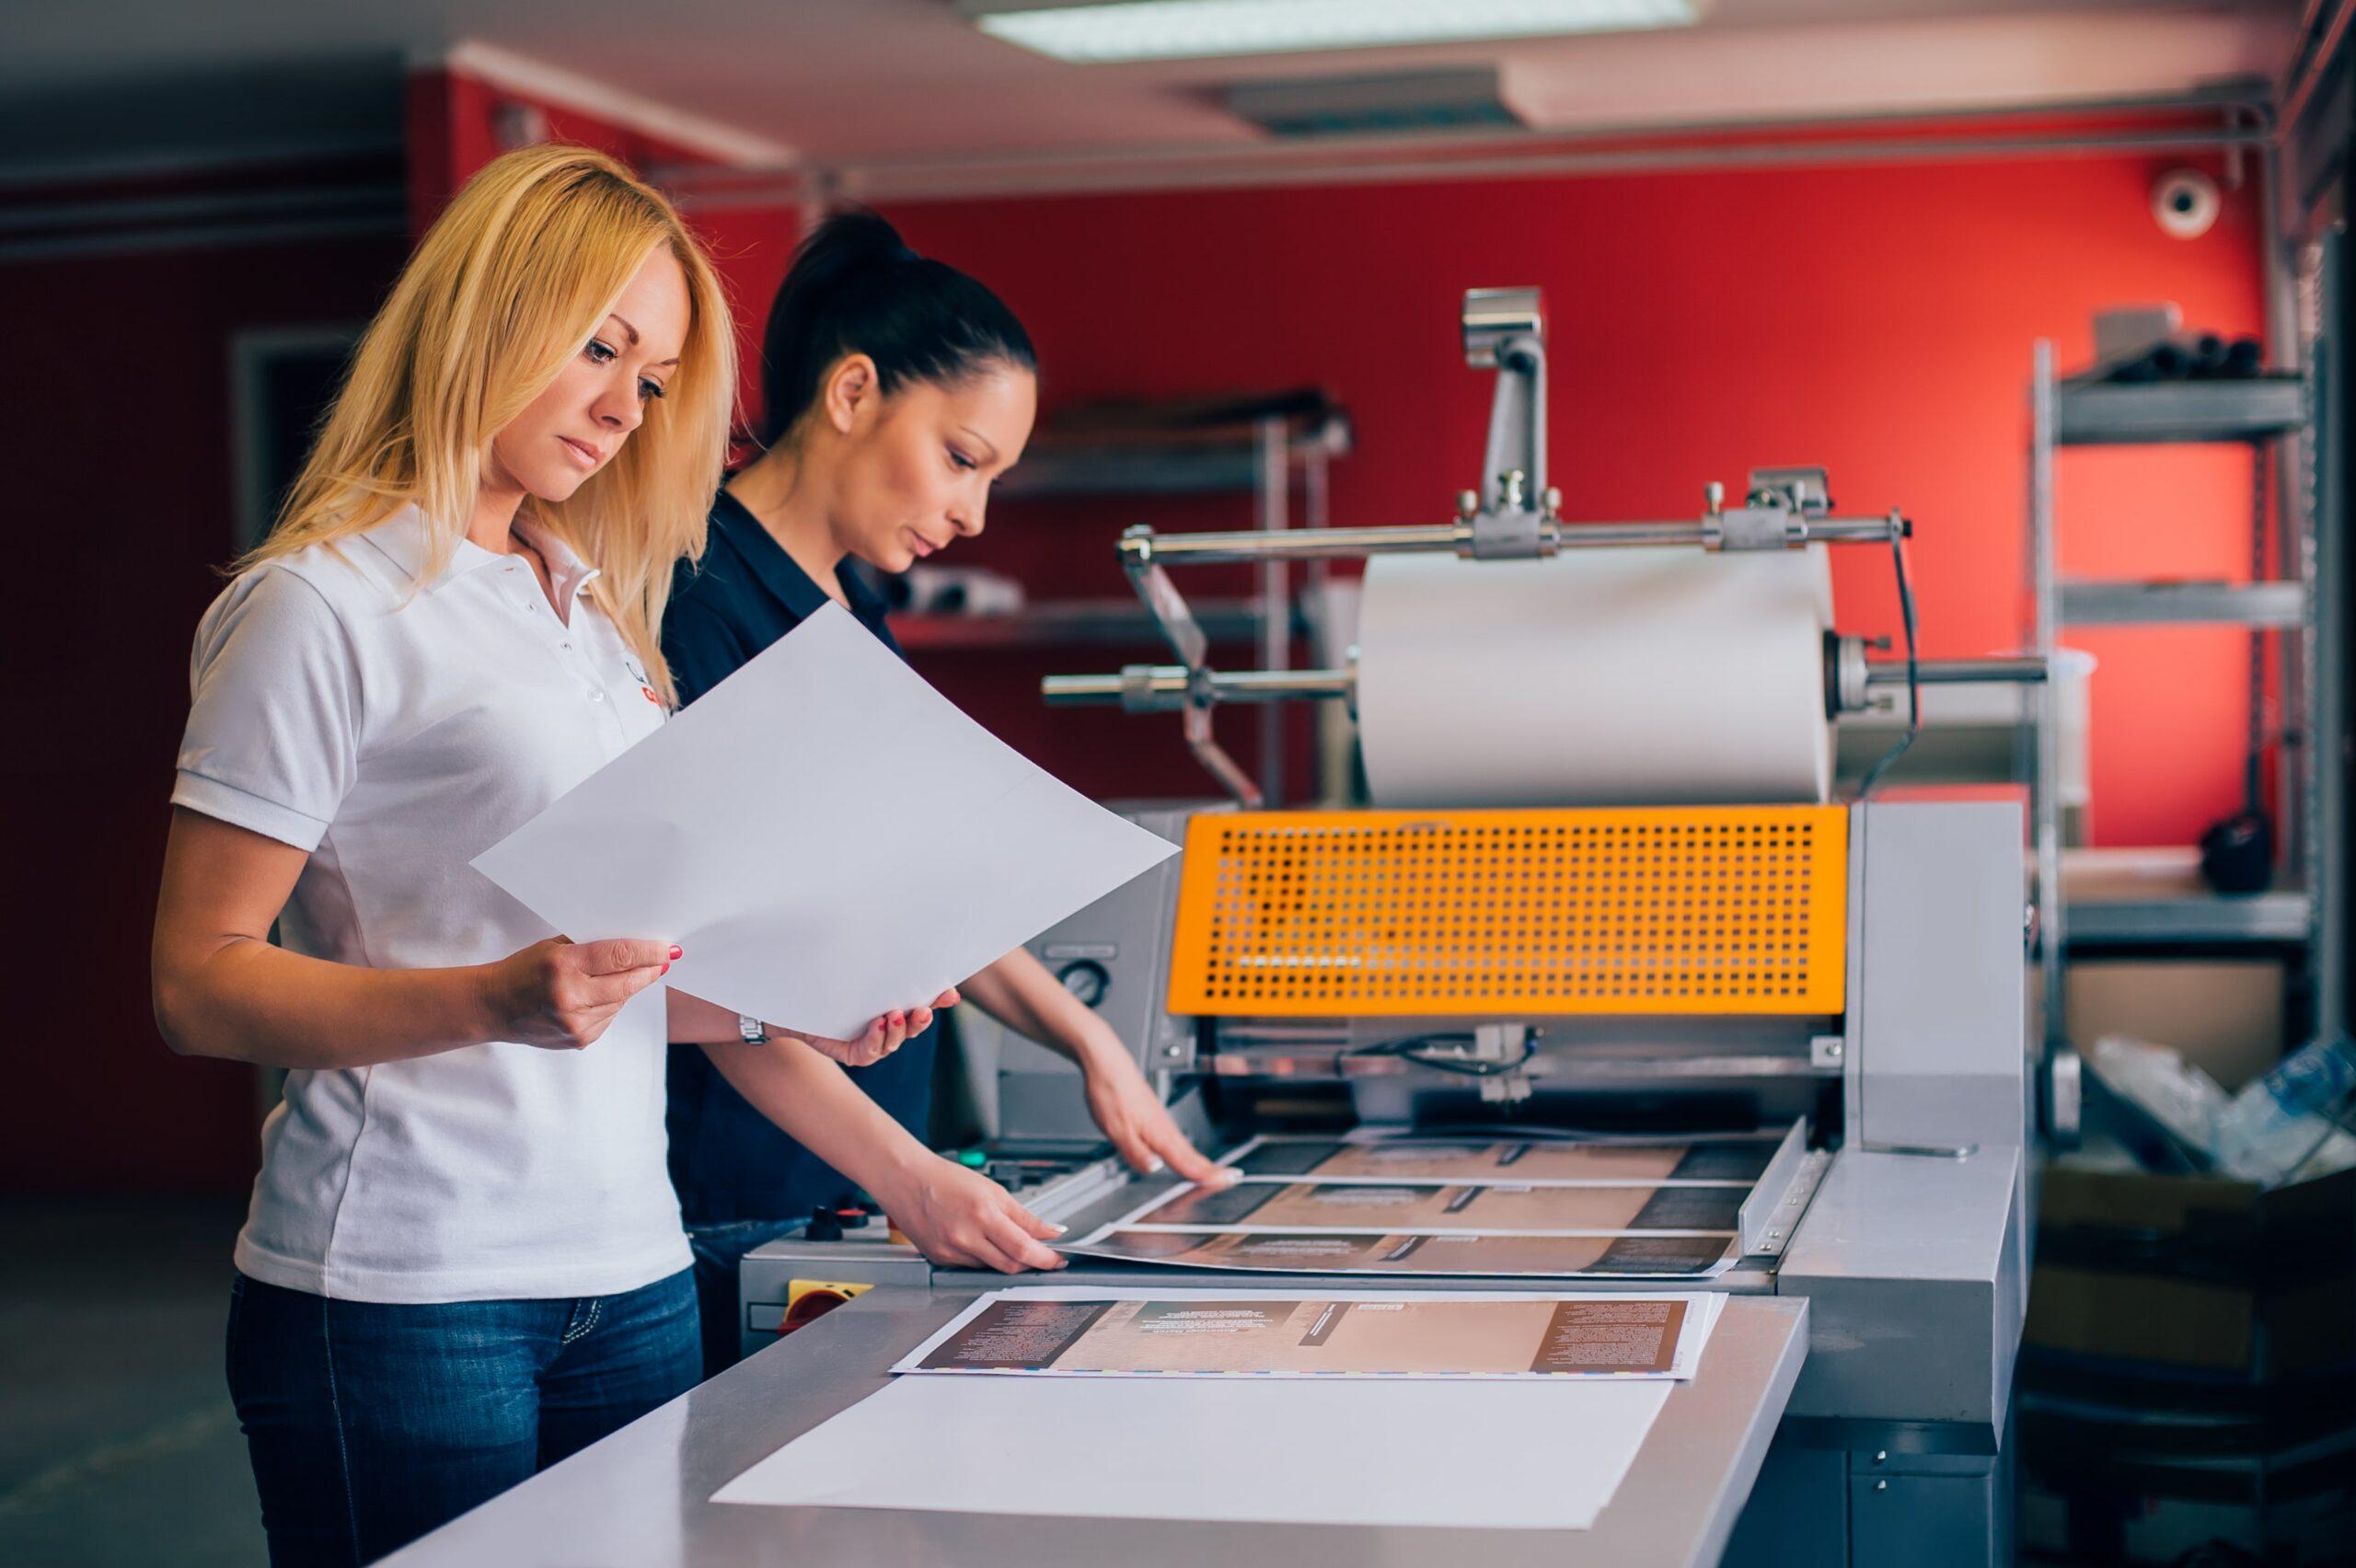 Two women at a printing press